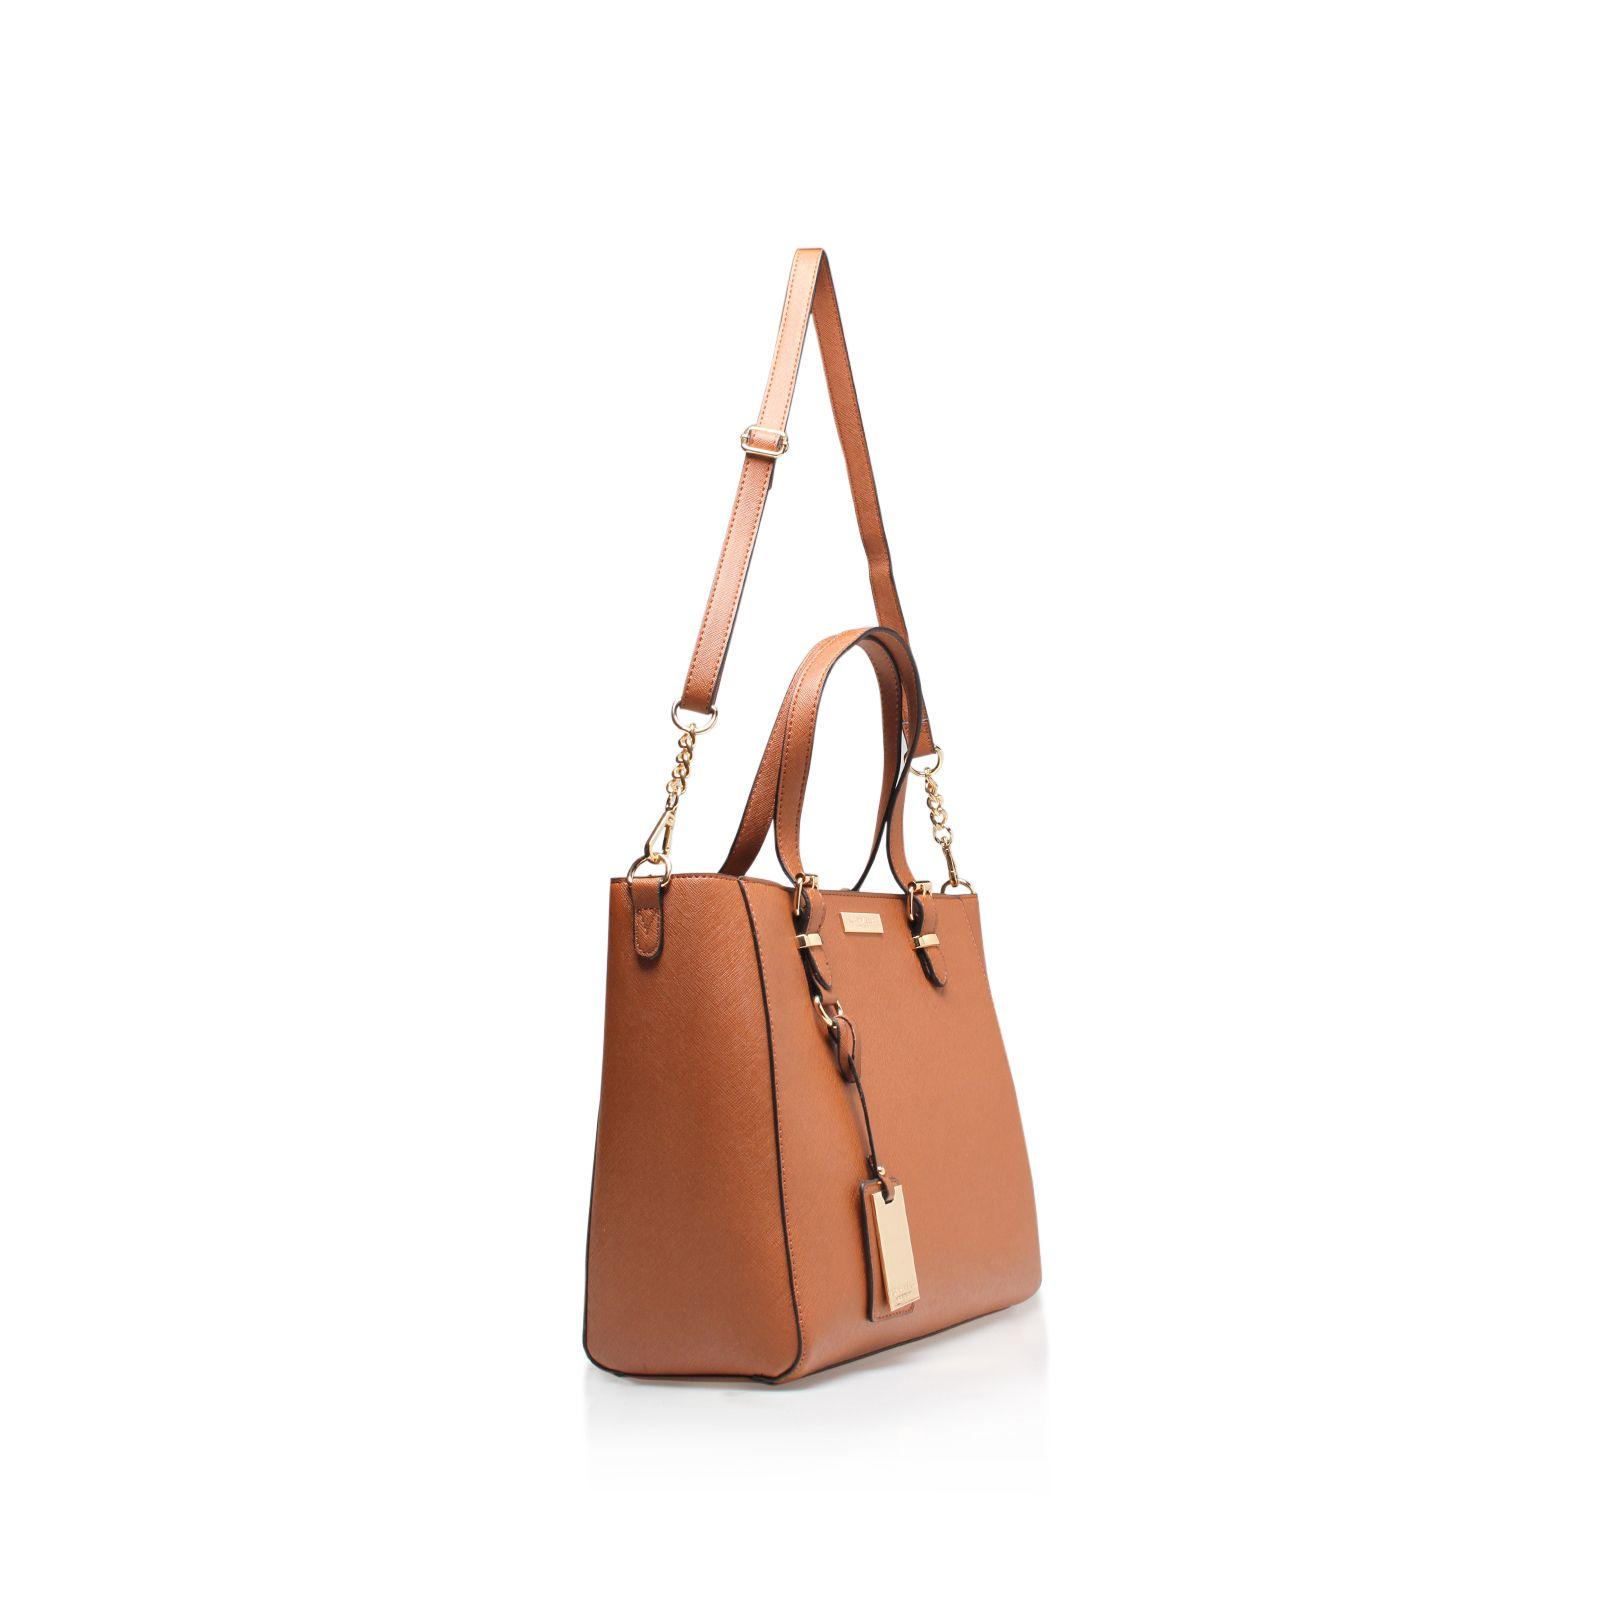 Dina Winged Tote Tan Bag By Carvela Kurt Geiger